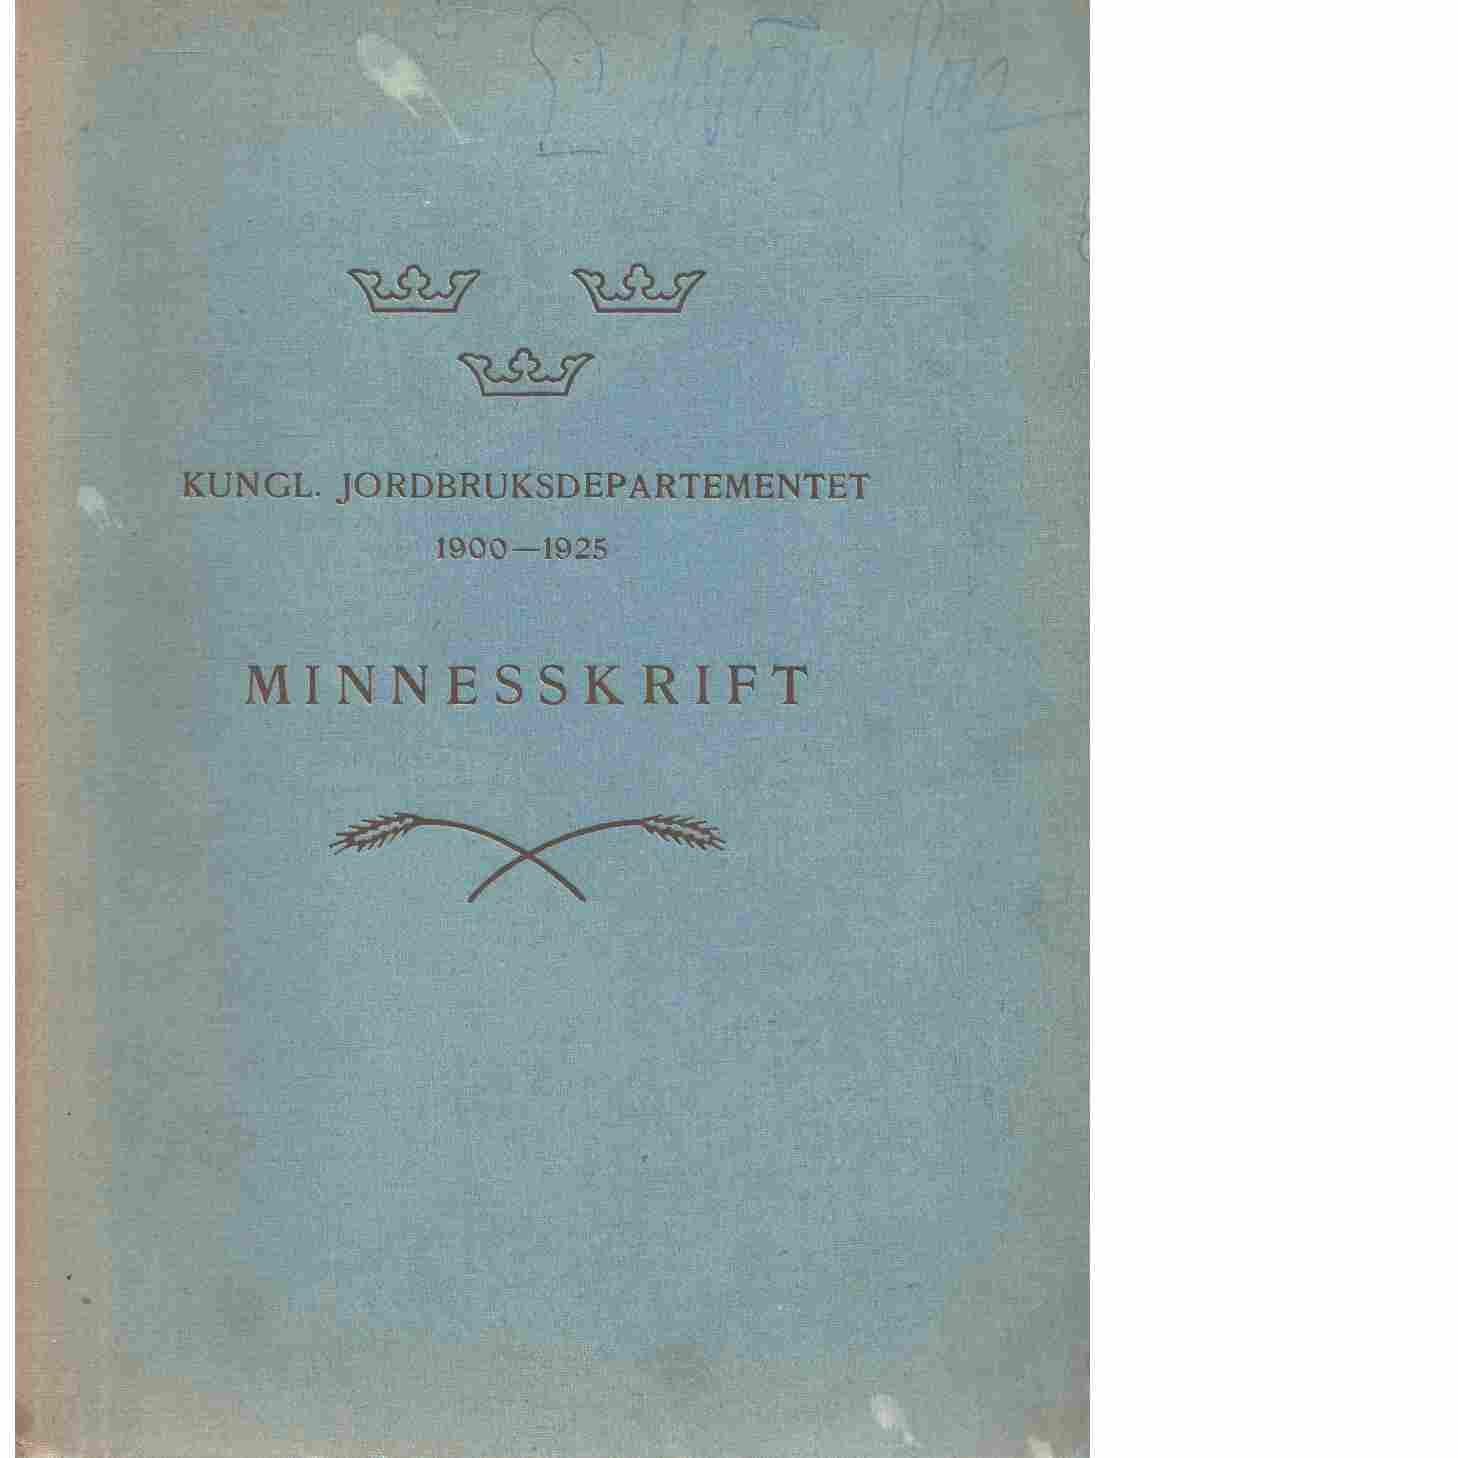 Kungl. Jordbruksdepartementet 1900-1925 : minnesskrift - Red.